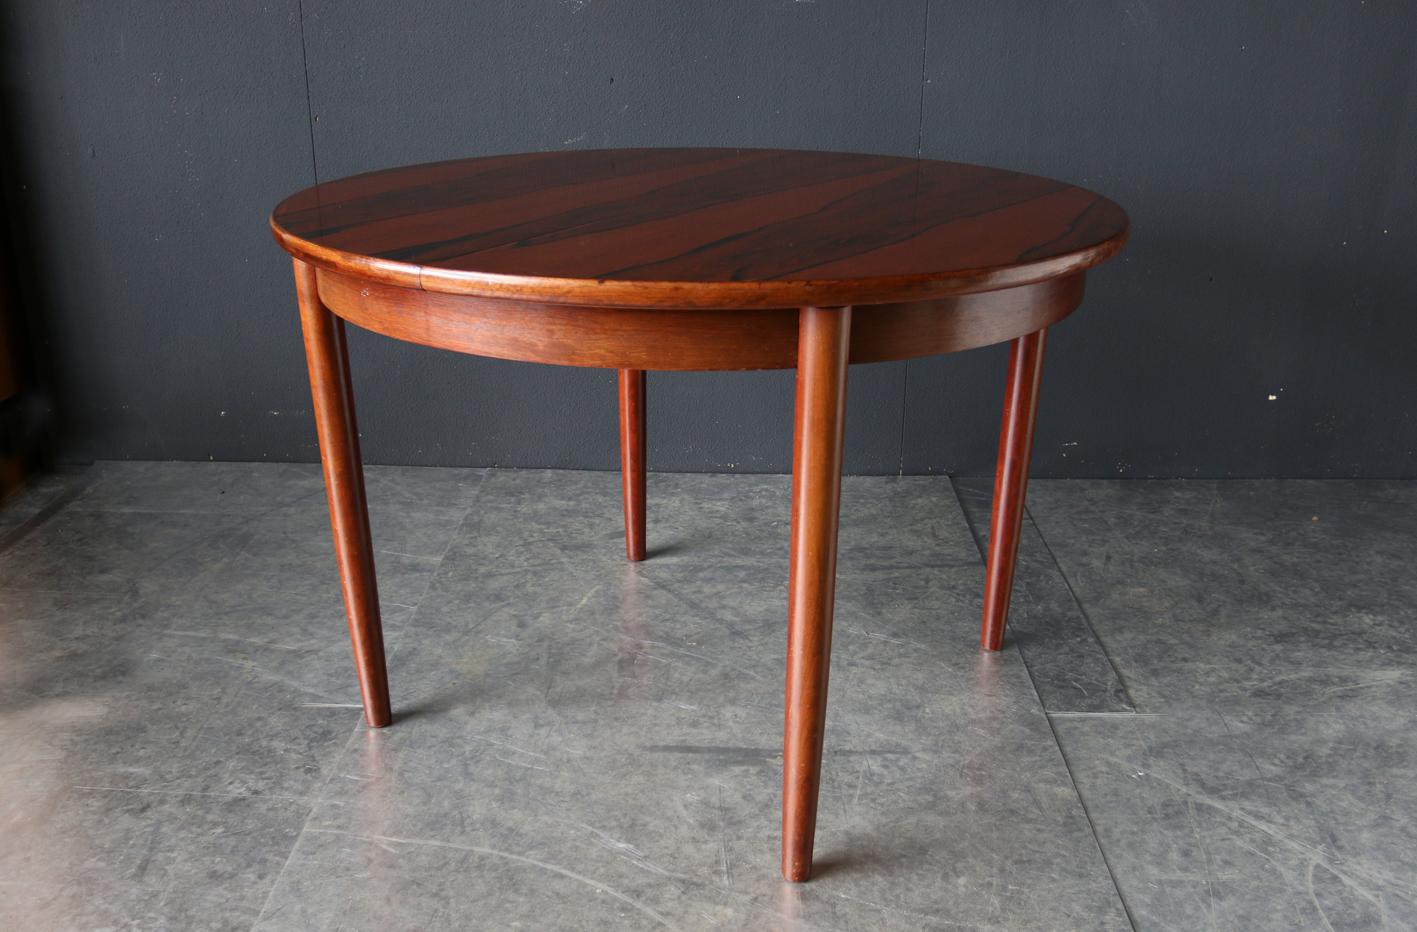 Marktplaats witte ronde tafel ikea ≥ ikea salon of bijzet tafels